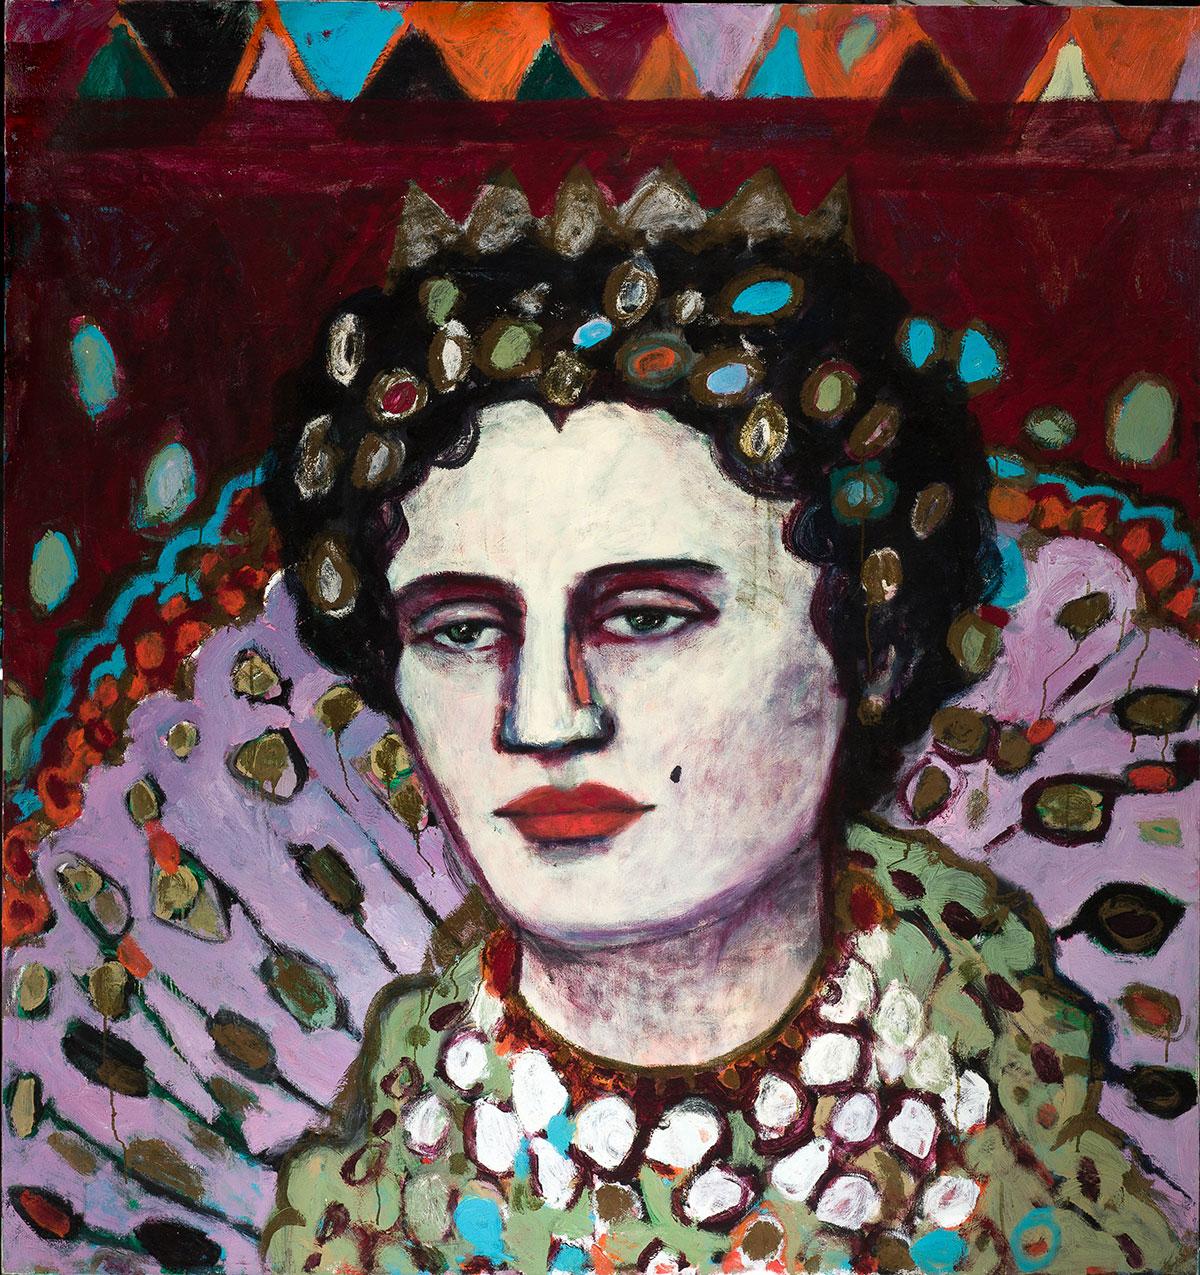 Elisabeth   -  160cm x 170cm,Oil on Canvas